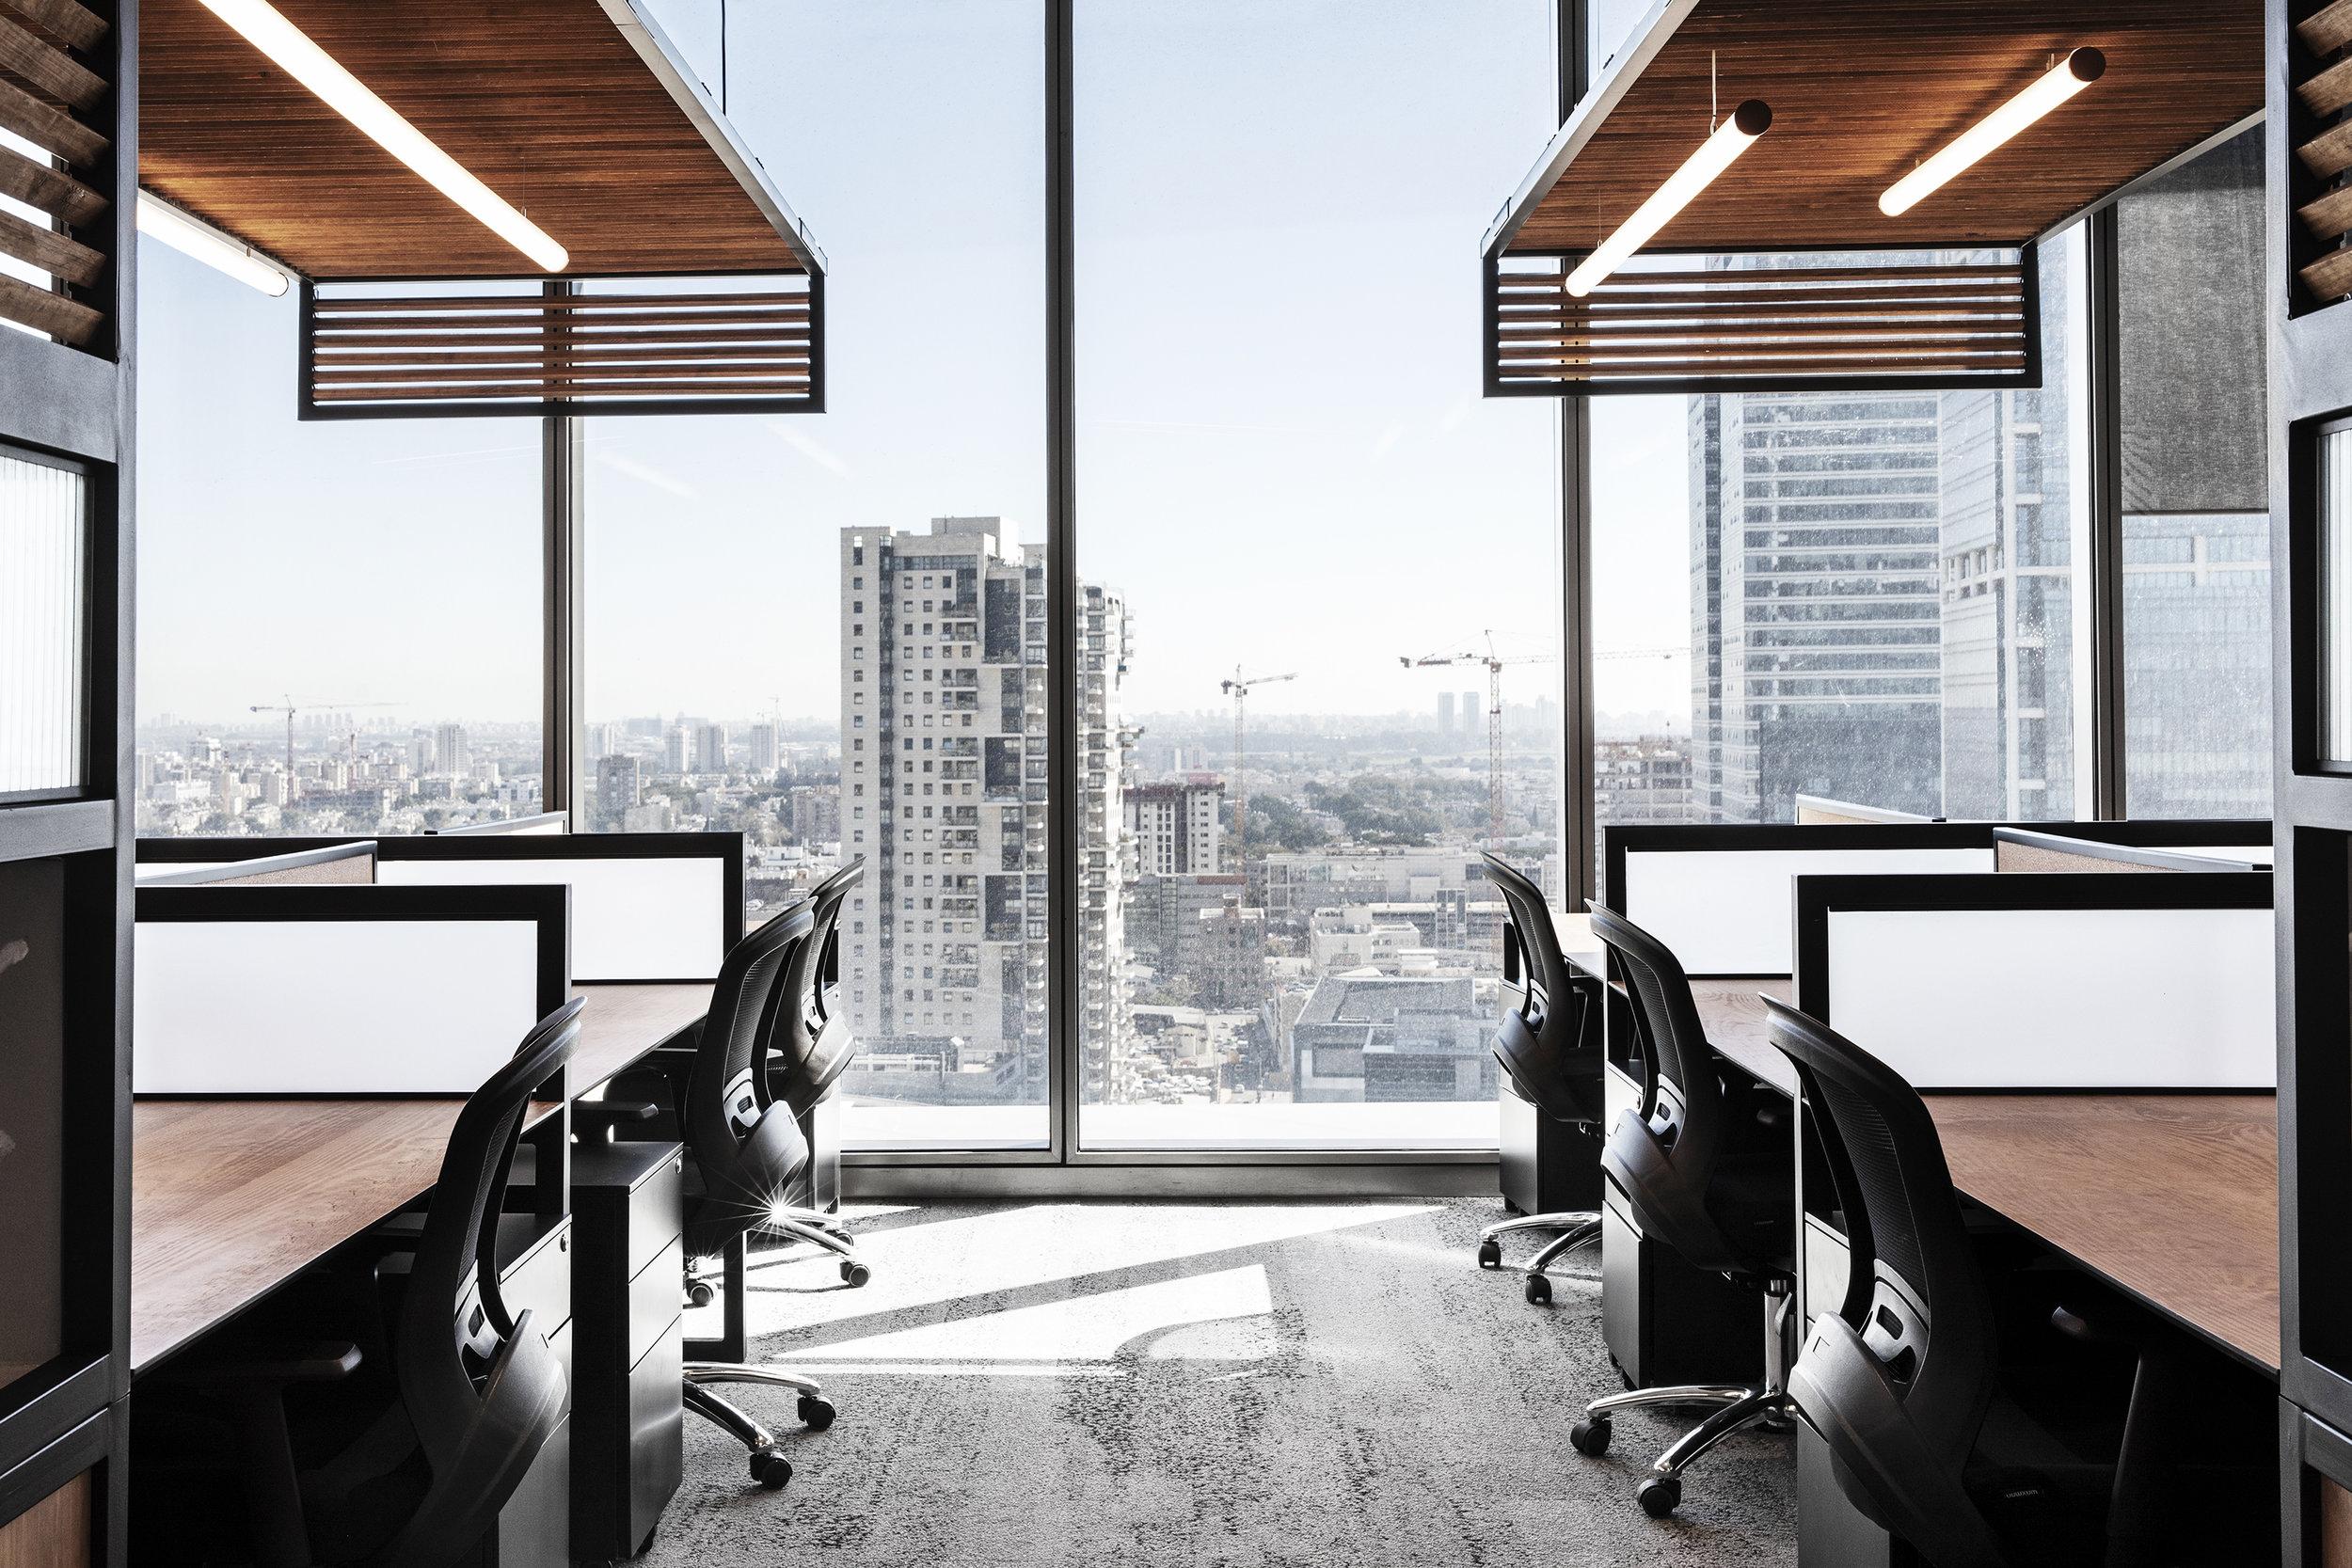 רואי דוד אדריכלות - אדריכל - נטורל אינטליג'נס - ROY DAVID - ARCHITECTURE - ARCHITECT - NI (90).jpg